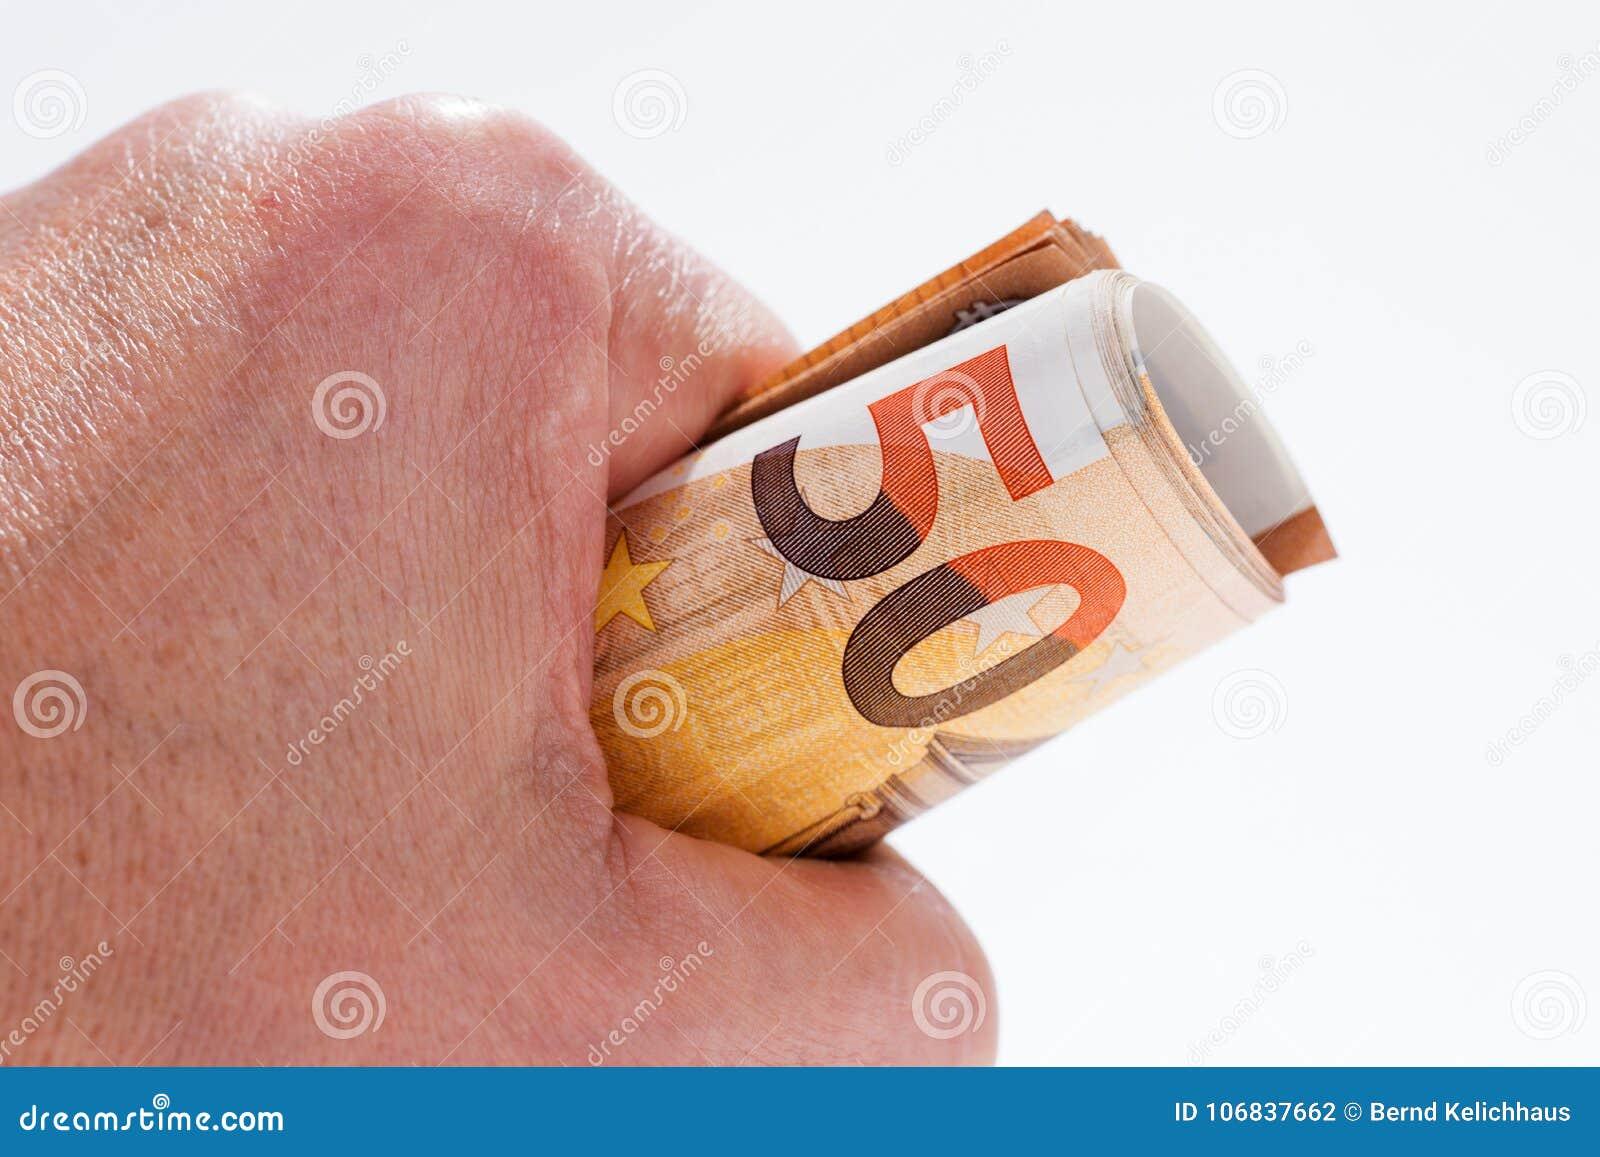 Un Petit Pain Avec Cinquante Euro Billets De Banque Dans La Main ... 9ee1cf99b2d0